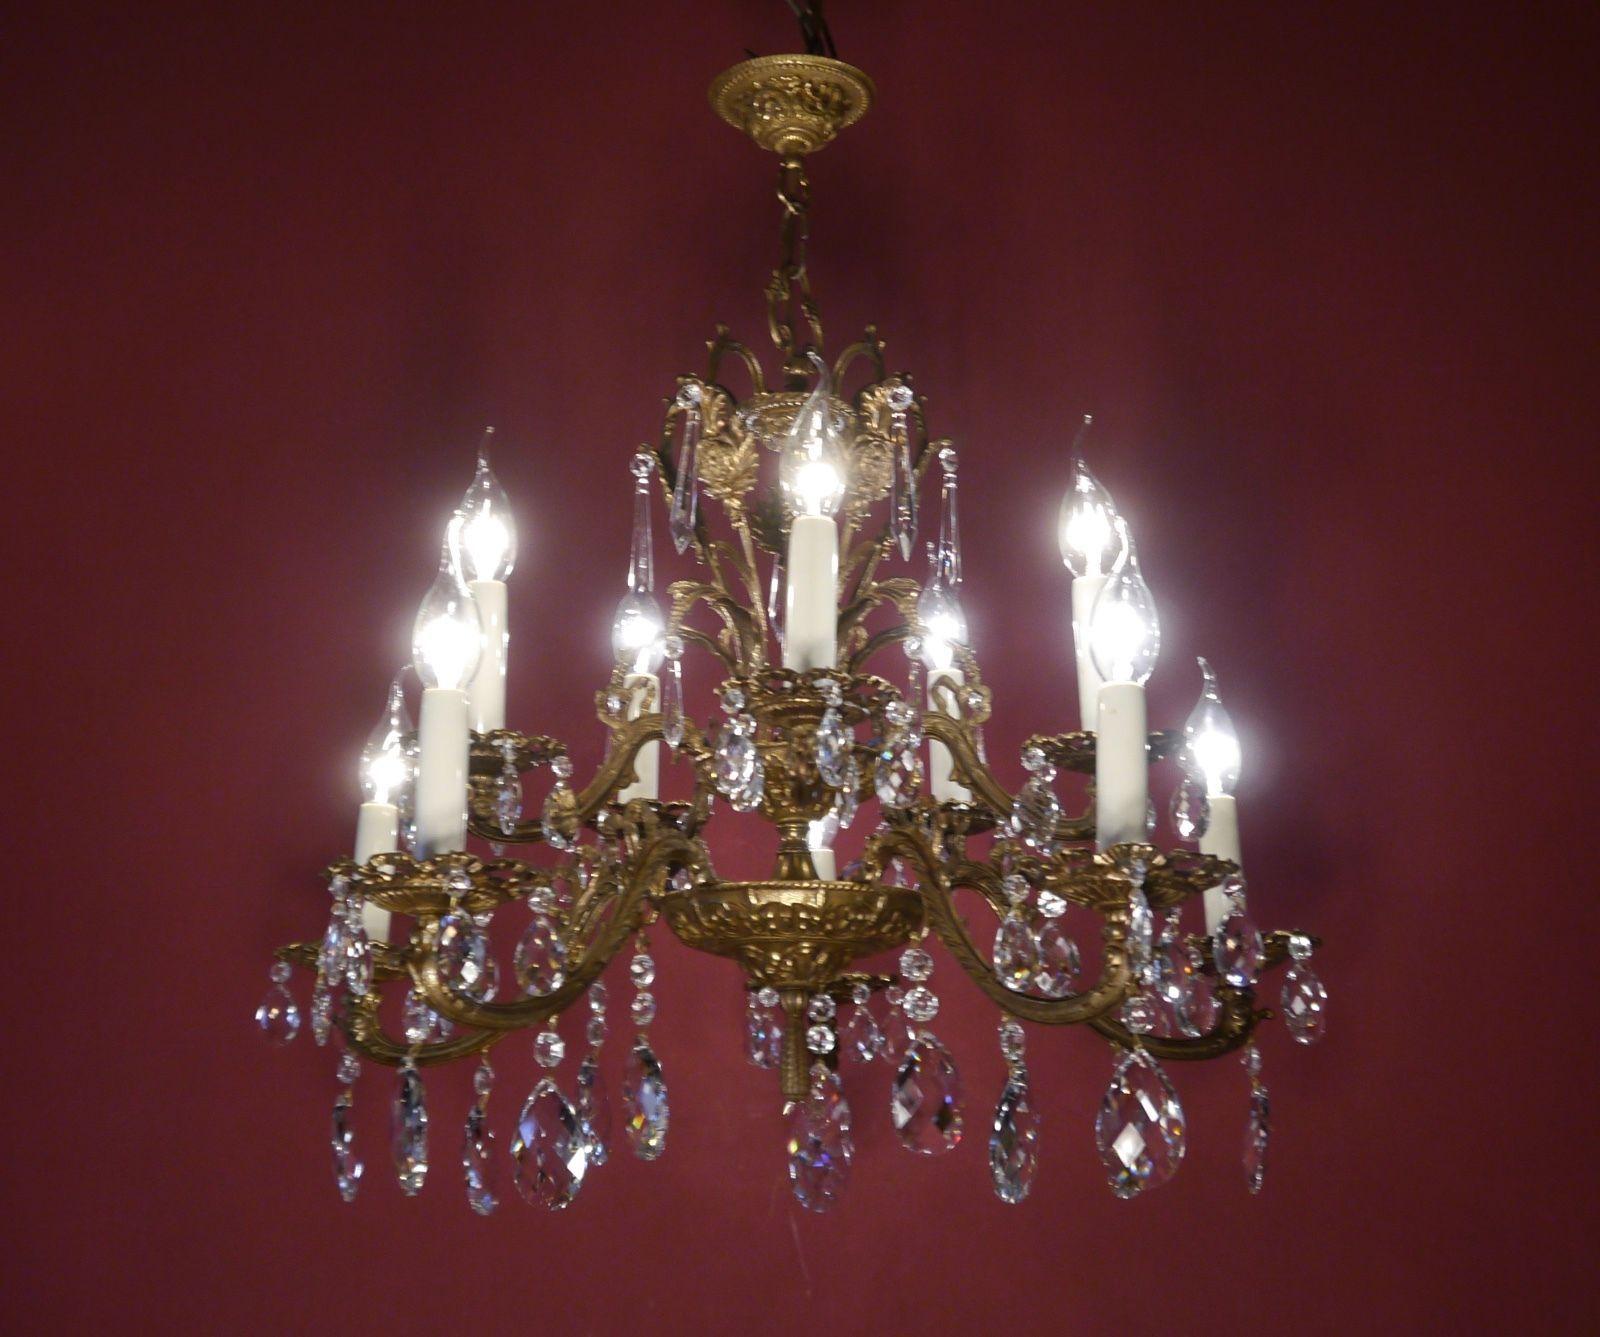 FINE HEART SHAPE CHANDELIER CRYSTAL GLASS VINTAGE OLD LAMP BRASS - Chandelier crystals ebay